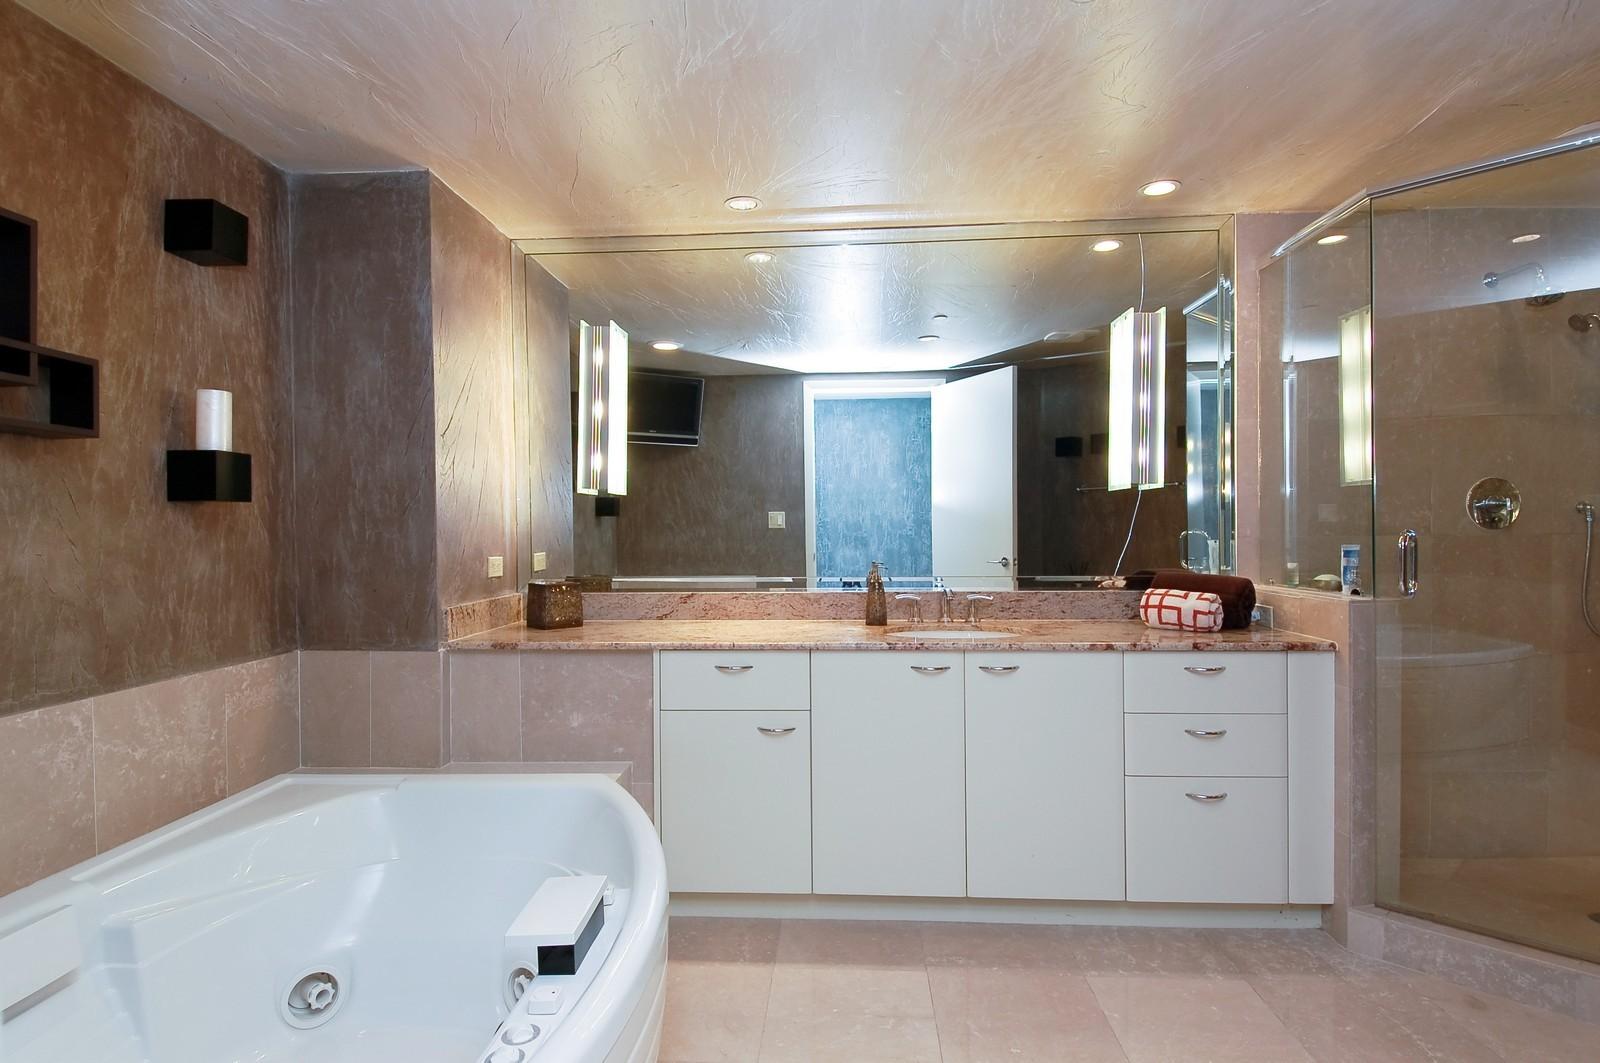 Real Estate Photography - 1600 S Ocean Blvd, Apt 802, Pompano Beach, FL, 33062 - Master Bathroom